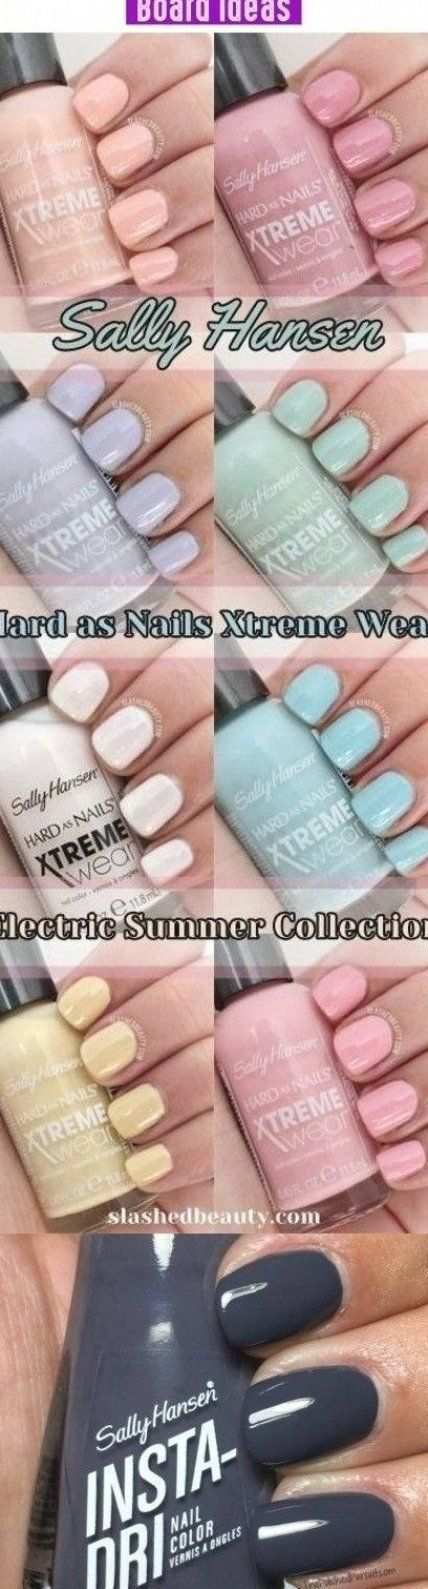 Sally hansen nail polish  nails  seoforpinterest  seo  beauty  nail polish color